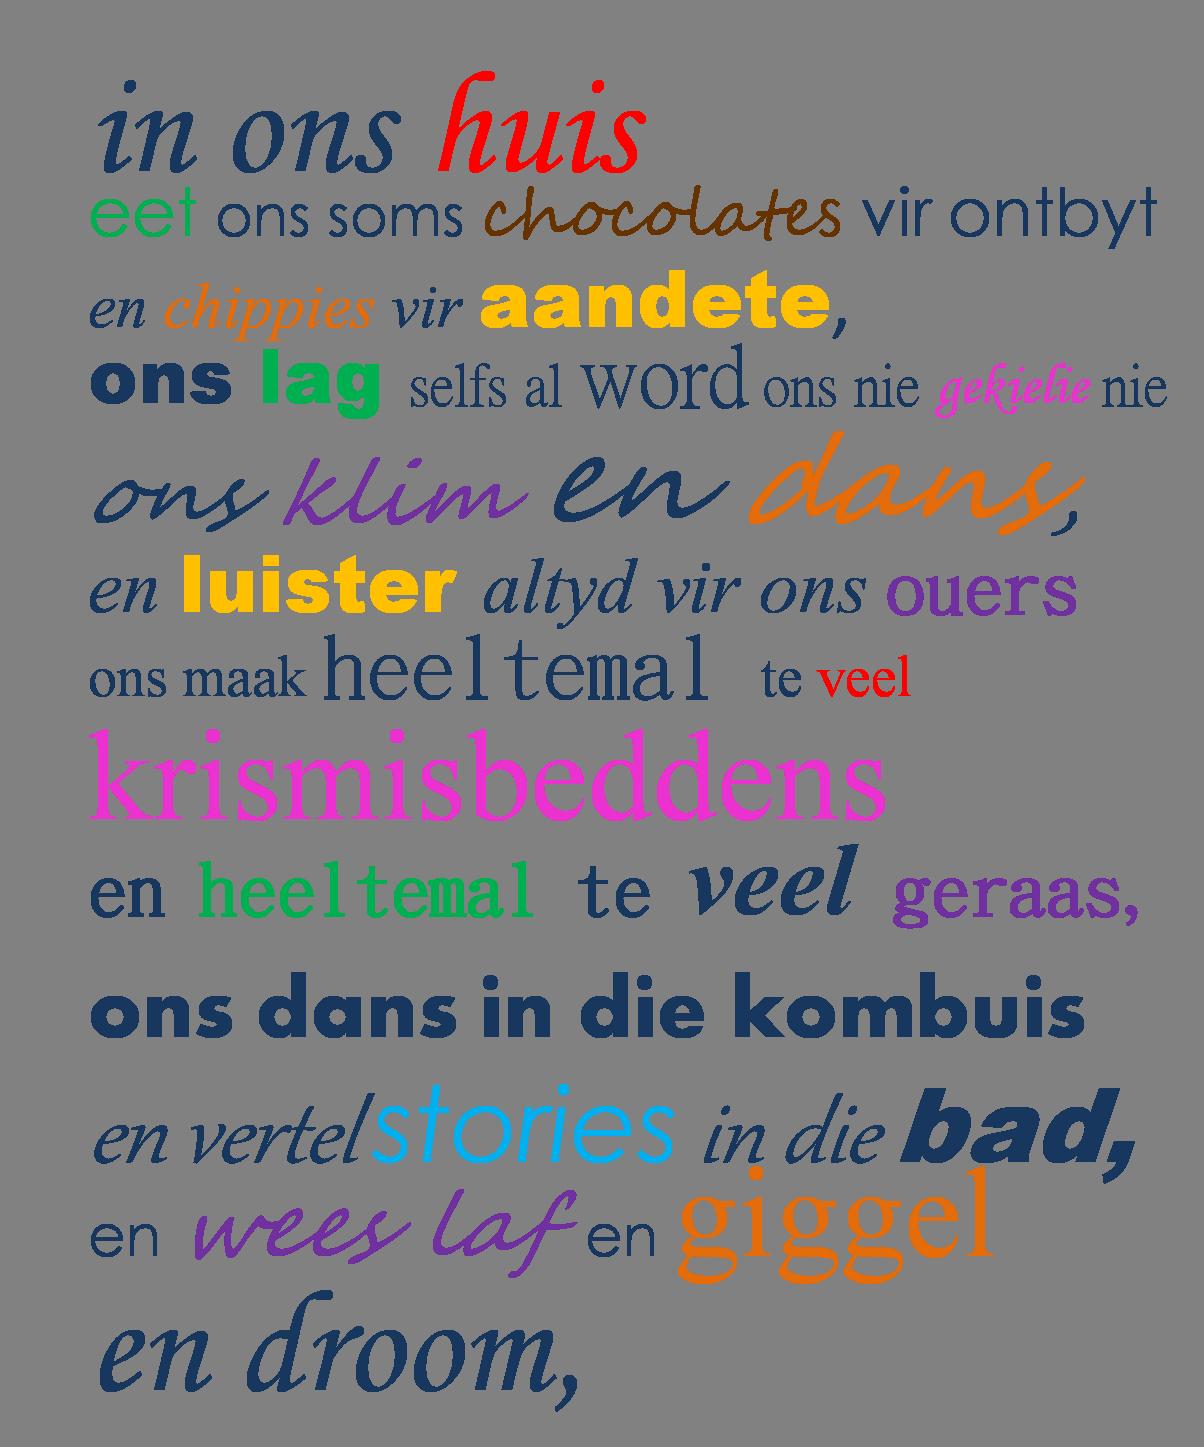 spreuken over taal Afrikaanse quotes: house rules geraam in 'n mooi ou houtraam  spreuken over taal